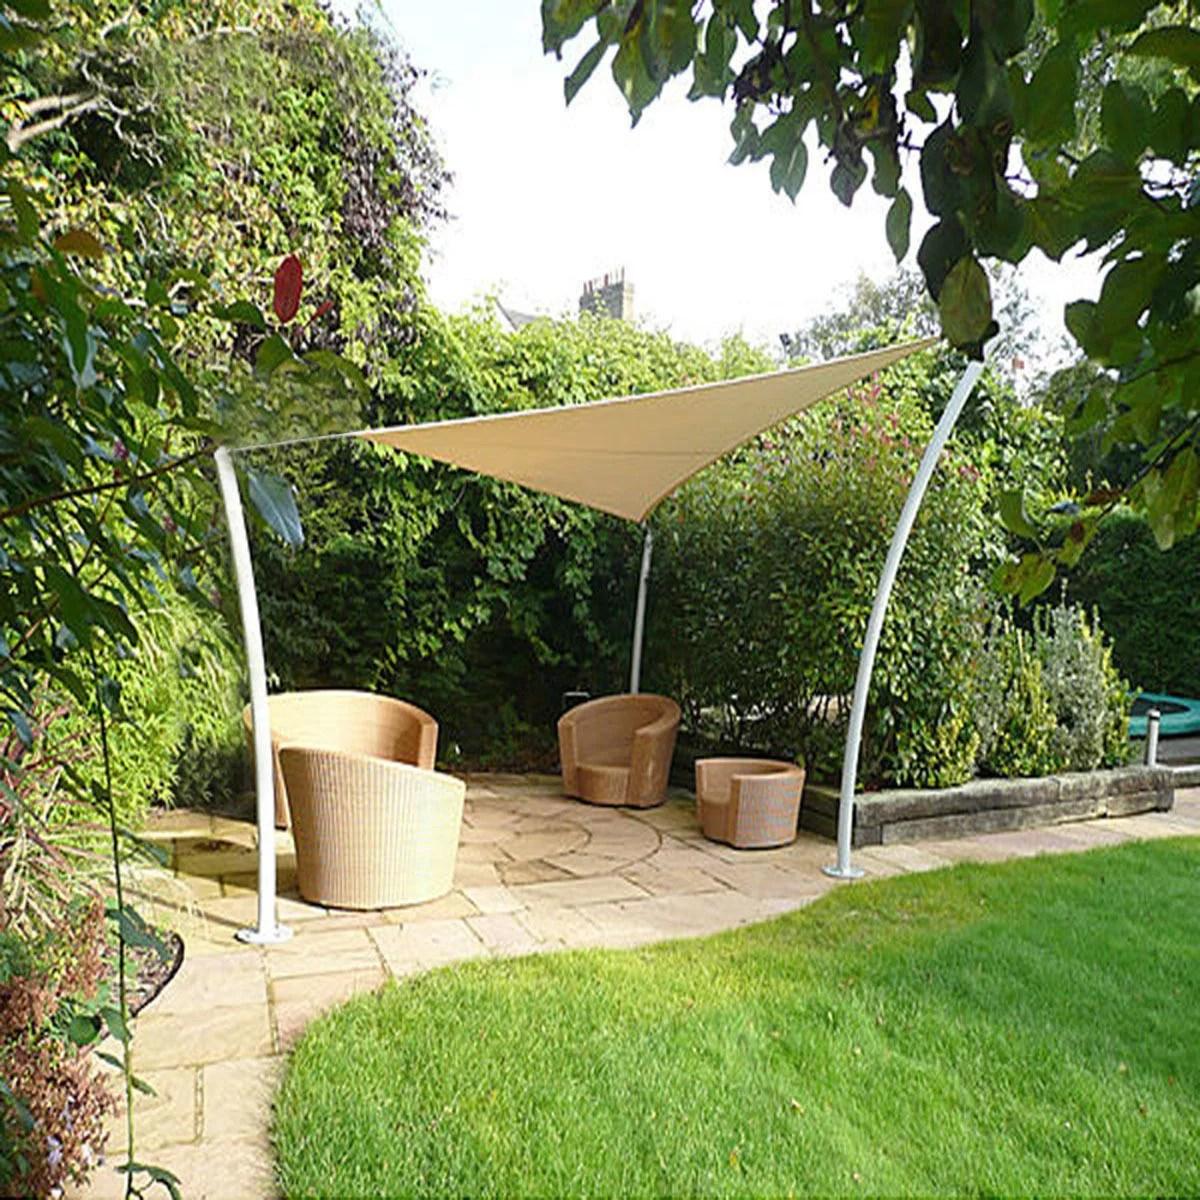 12 x 12 ft feet triangle uv heavy duty sun shade sail patio cover sand canopy walmart com